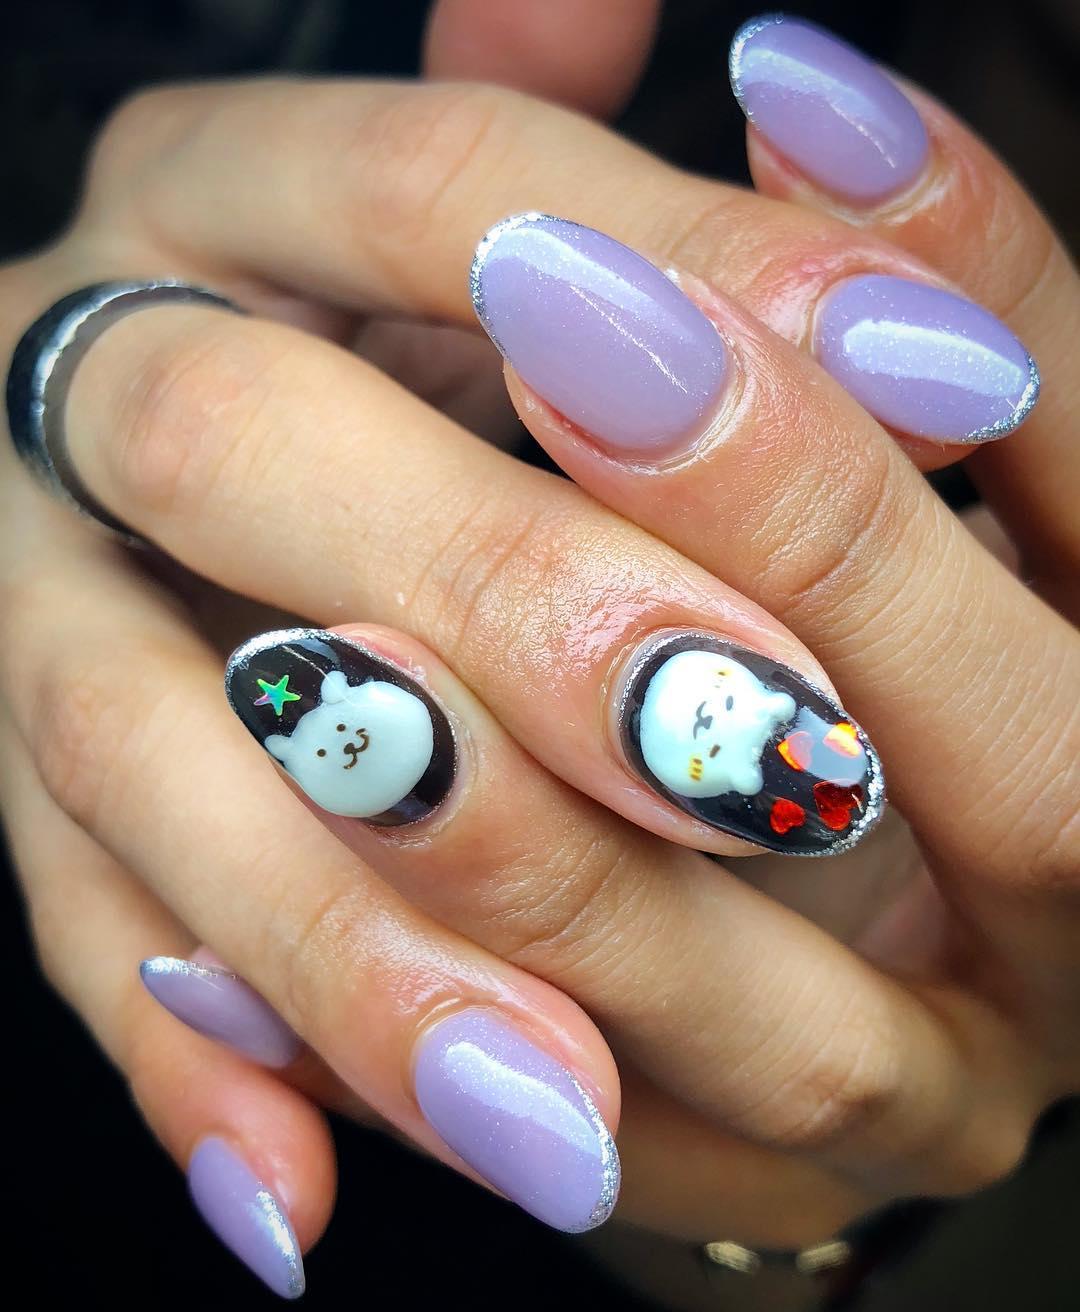 amazing 3d nail art ideas 2019 14 - 17 Amazing 3D Nail Art Ideas 2019